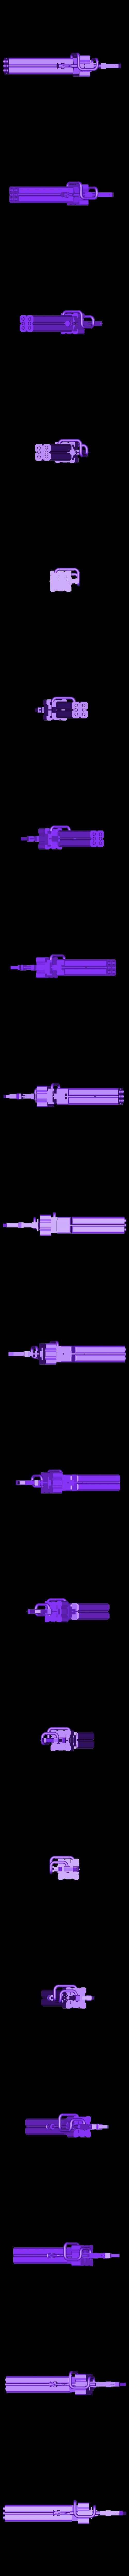 Titanfall_Northstar_Plasma_Railgun.stl Download free STL file Titanfall Northstar Plasma Railgun • 3D printer object, Z-mech